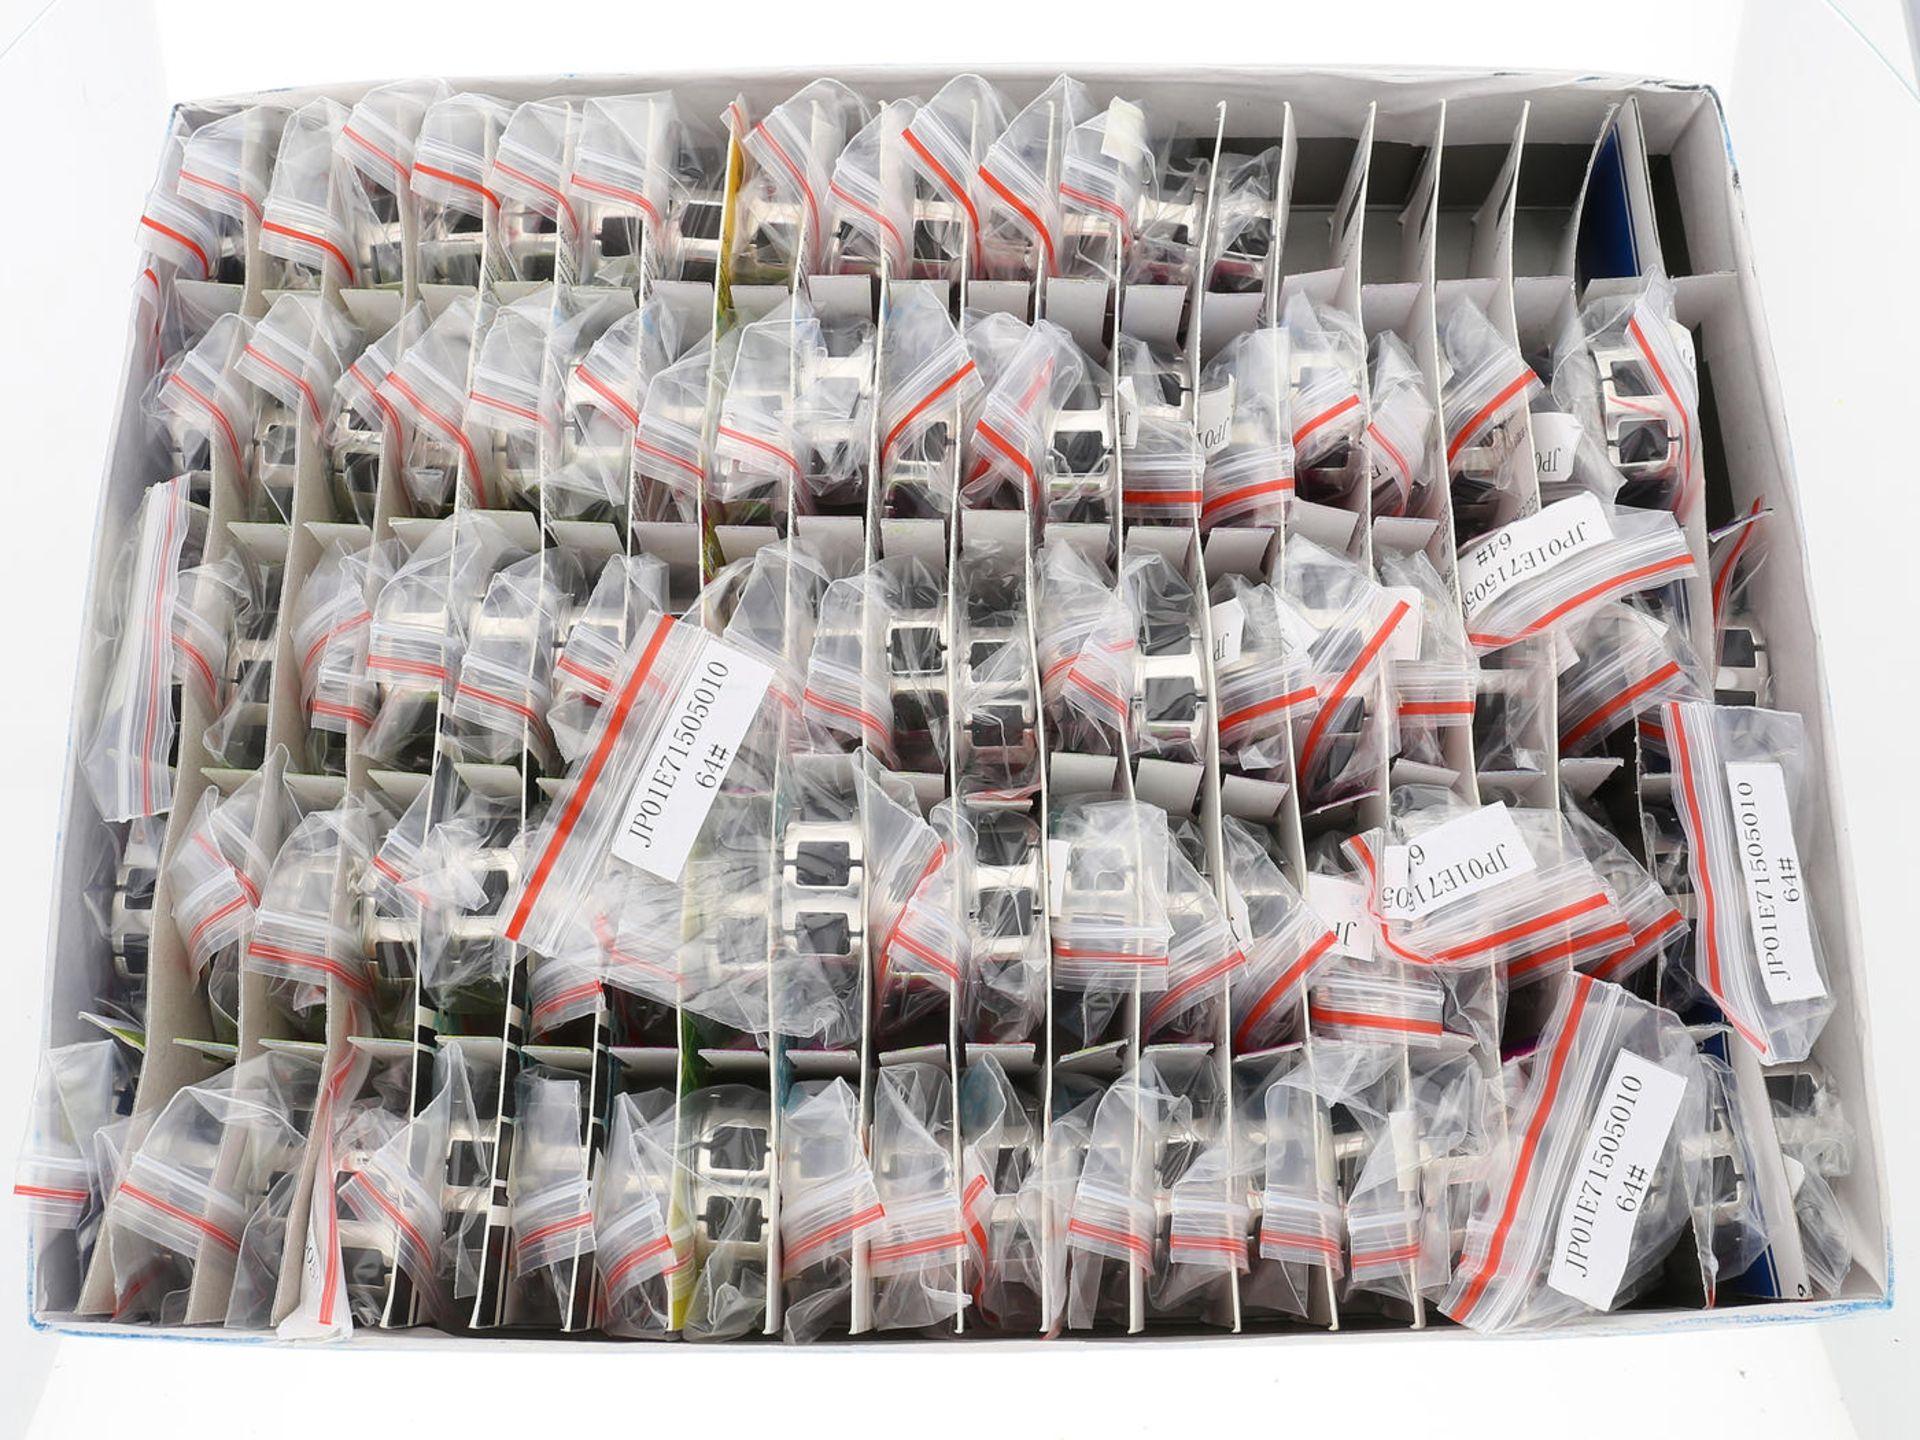 Los 6035 - Ring: neuwertige, ungetragene, originalverpackte Partie Designerringe, s.Oliver Herren-Edelstahl-